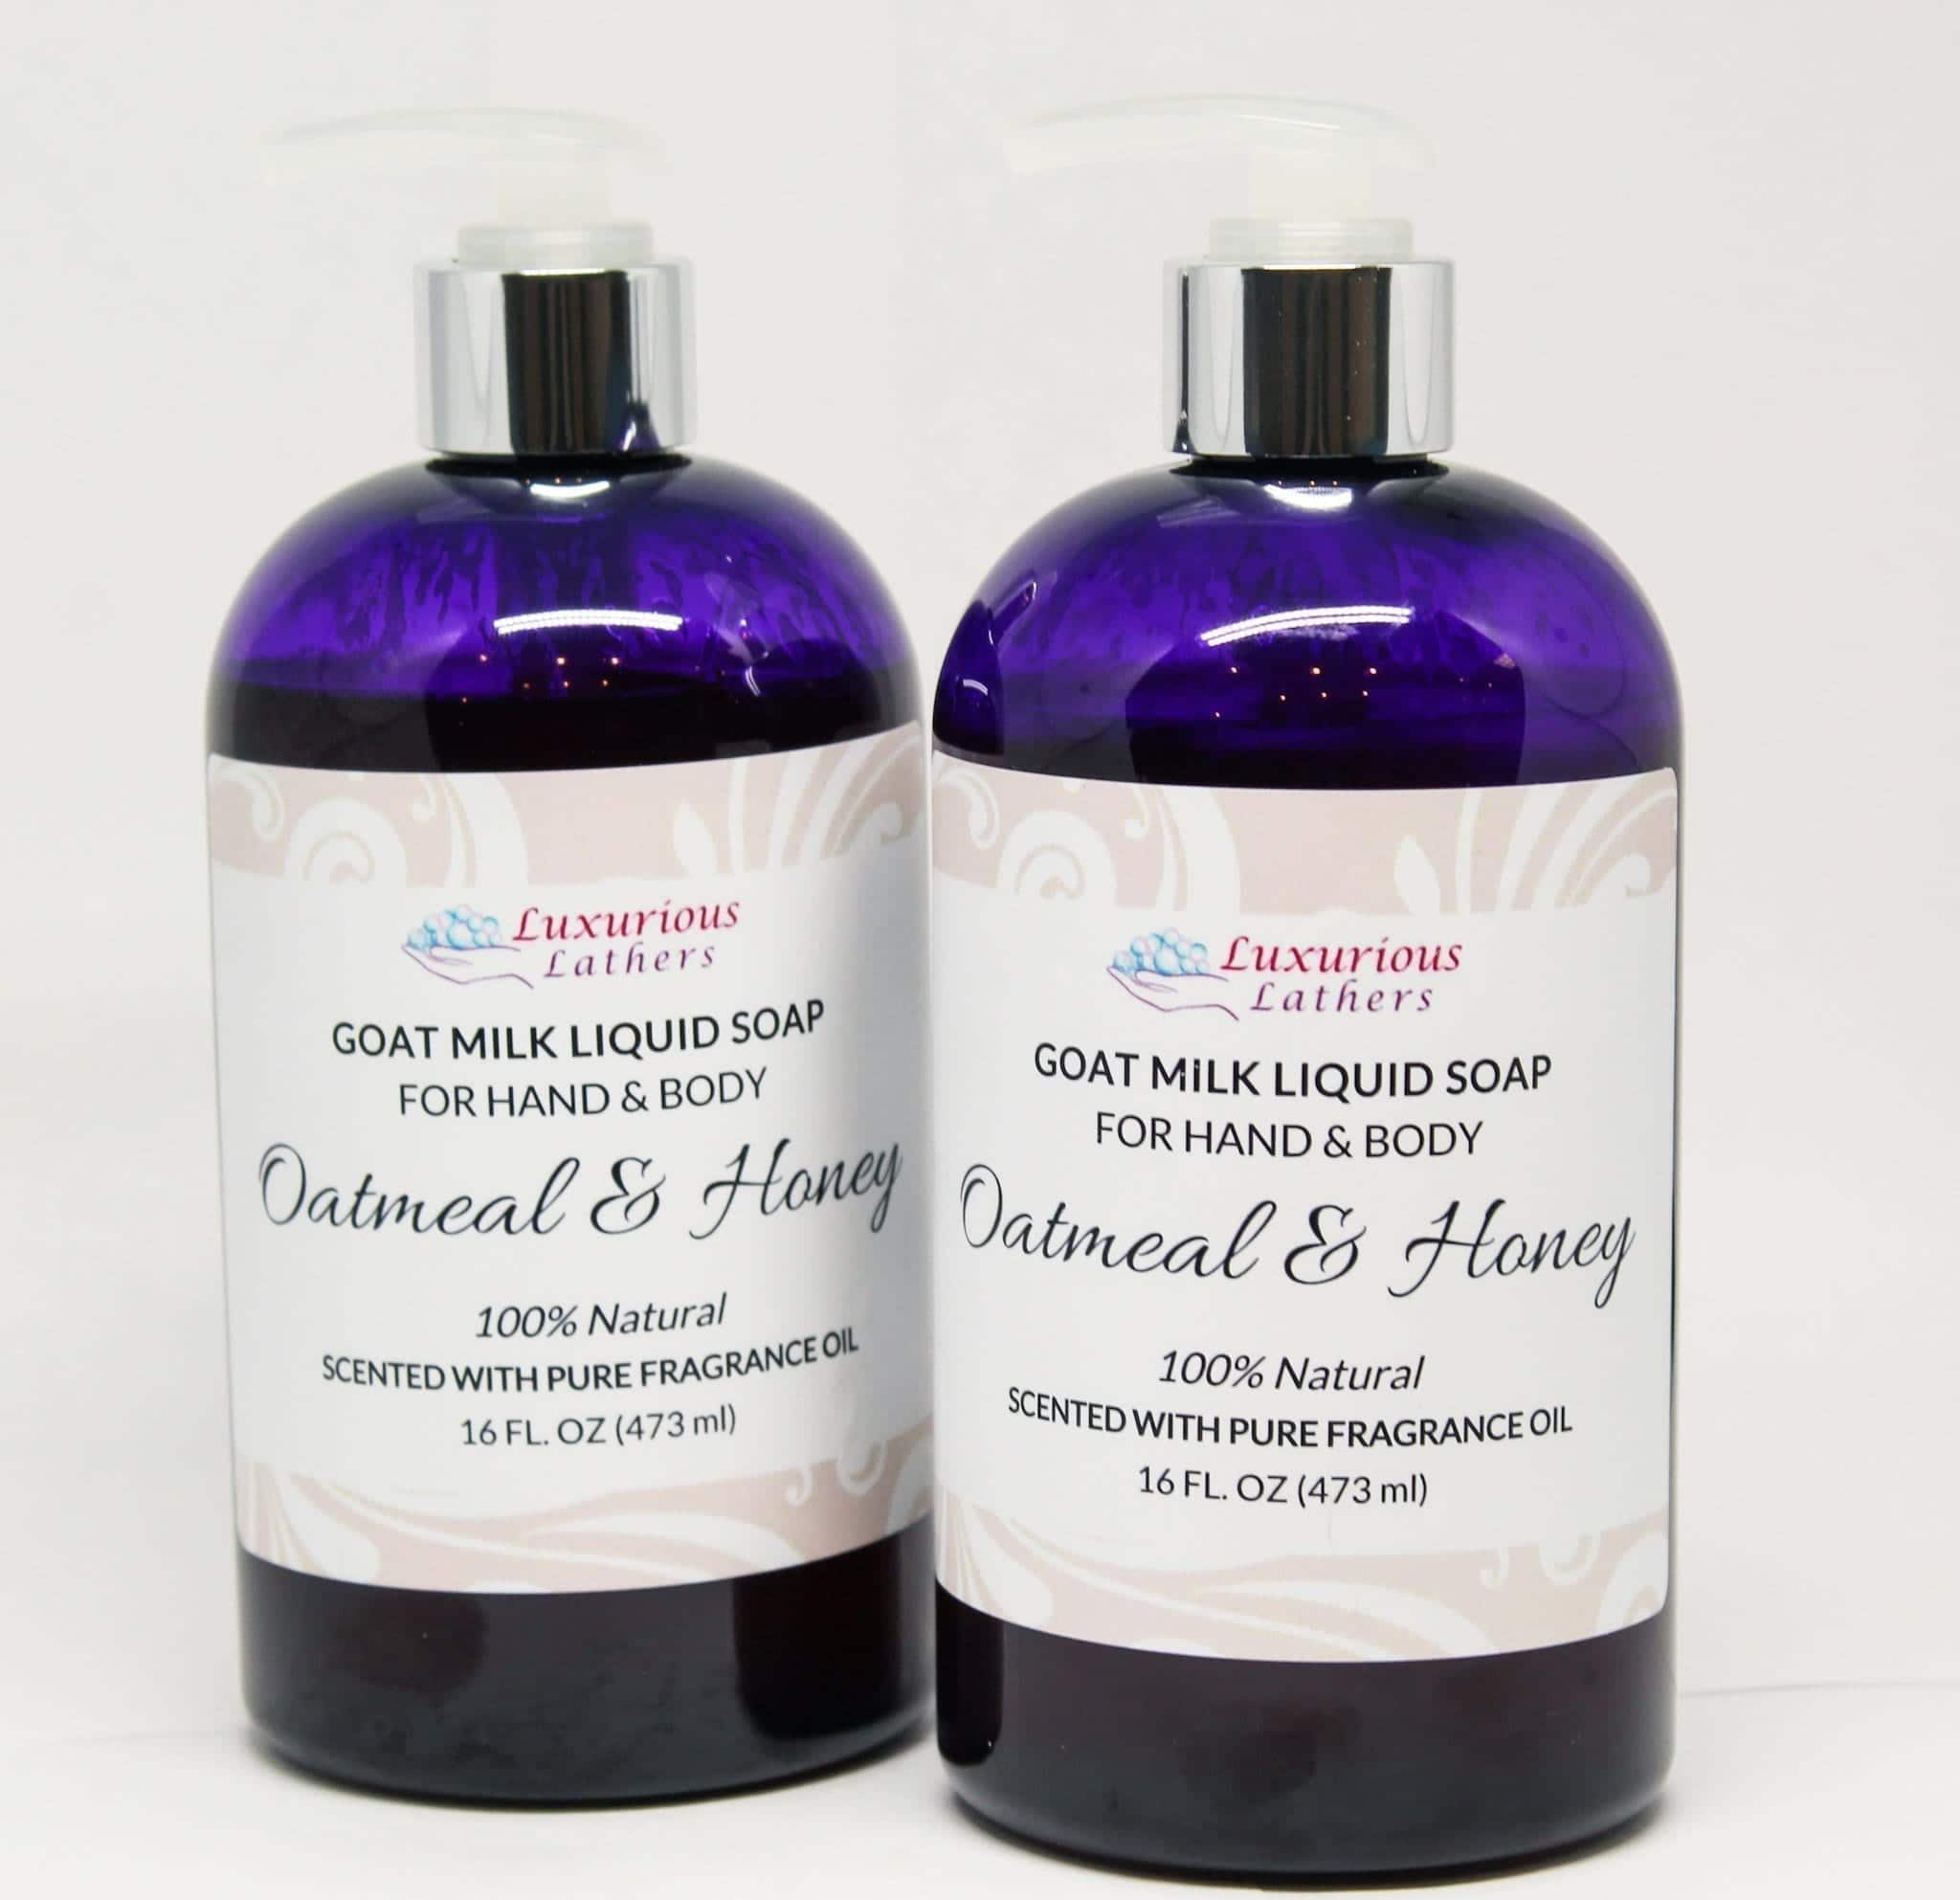 Oatmeal & Honey Goat Milk Liquid Soap